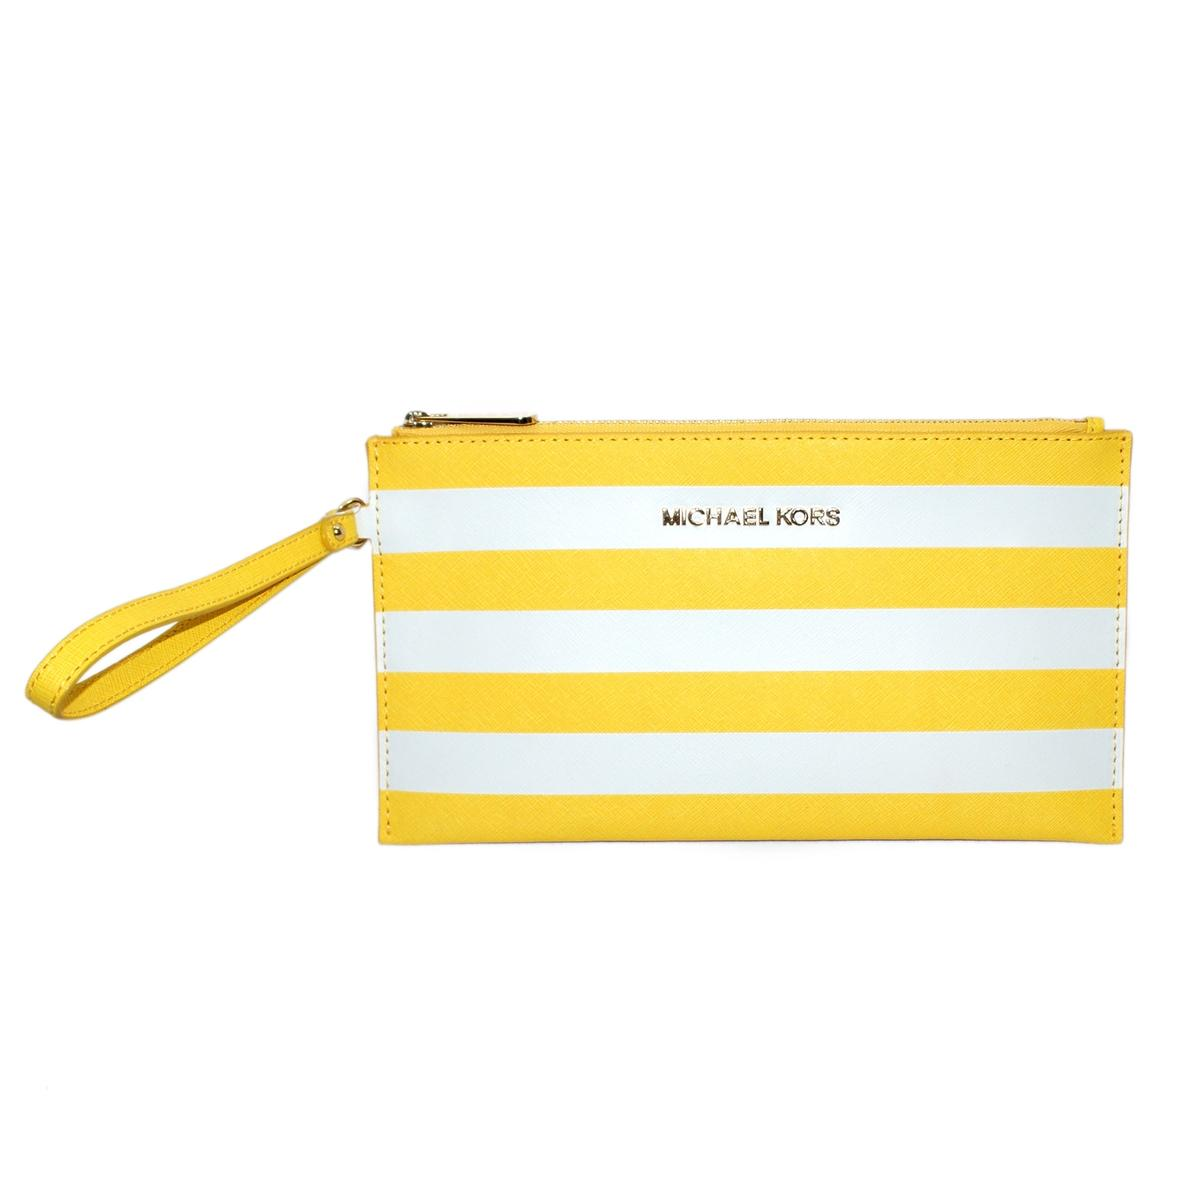 ac89104d81 Home · Michael Kors · Jet Set Travel Stripe Genuine Leather Flat Large Zip  Clutch  Wristlet Citrus. CLICK THUMBNAIL TO ZOOM. Found ...